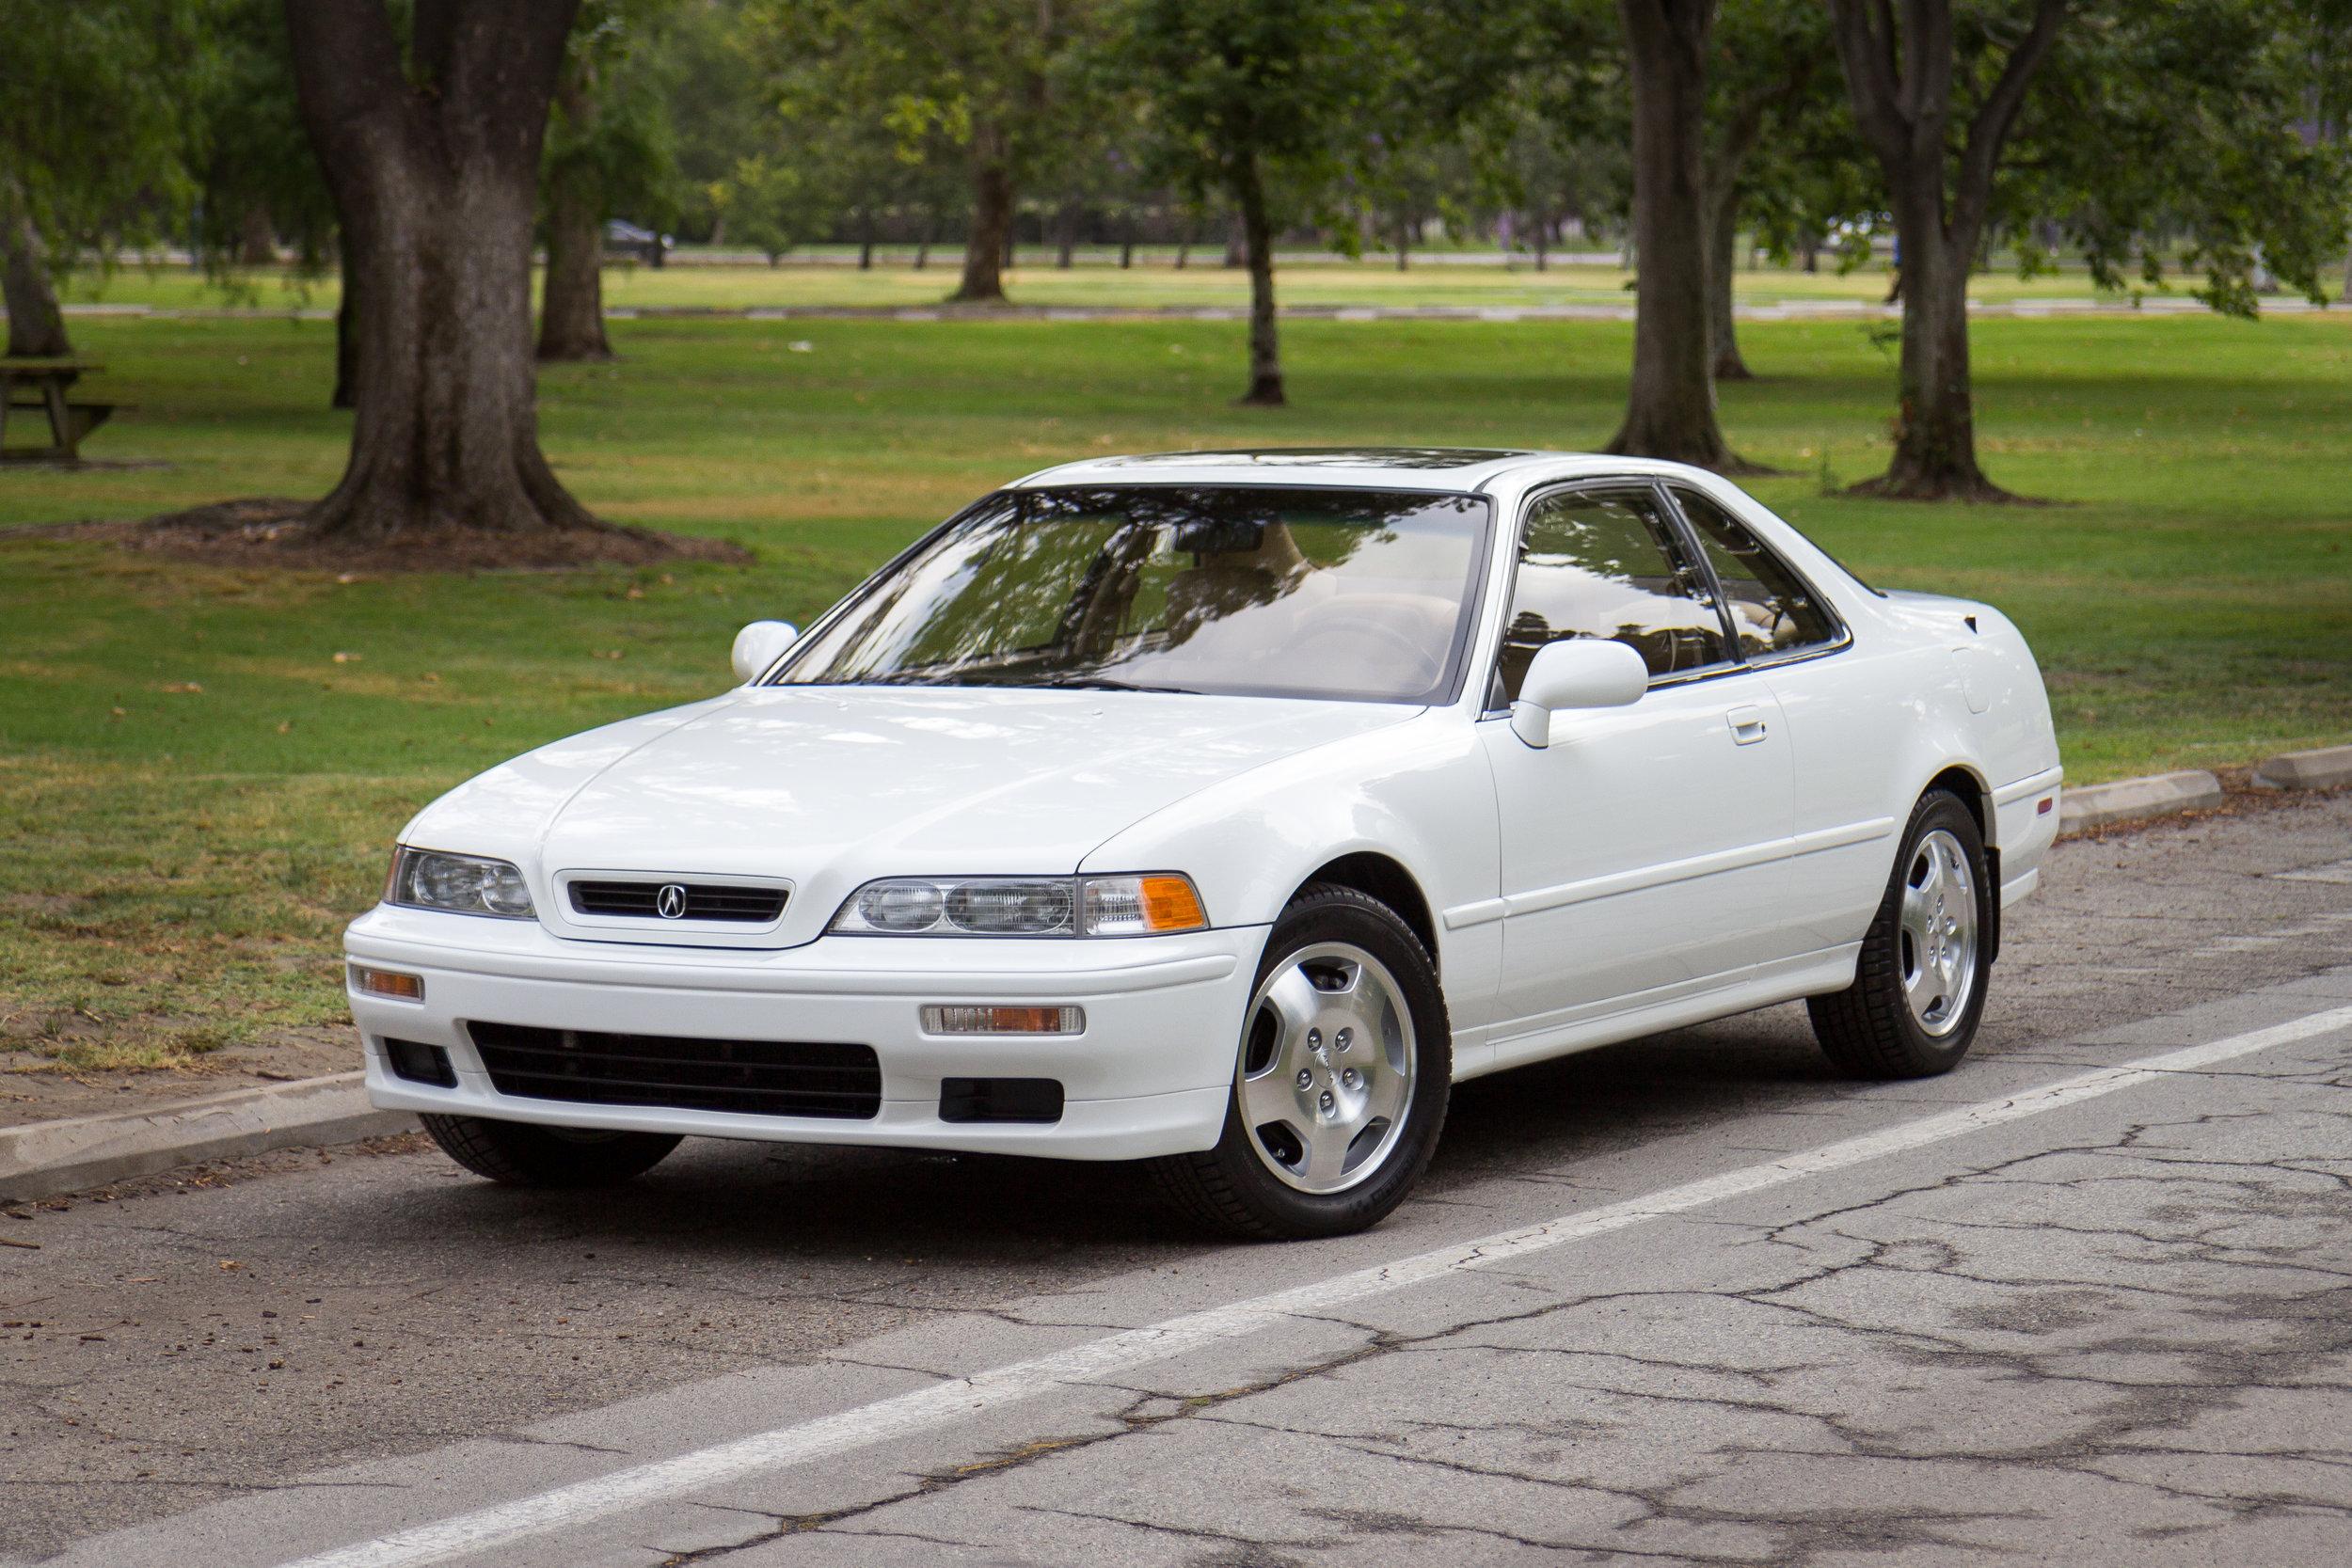 1994 Acura Legend Coupe-3.JPG